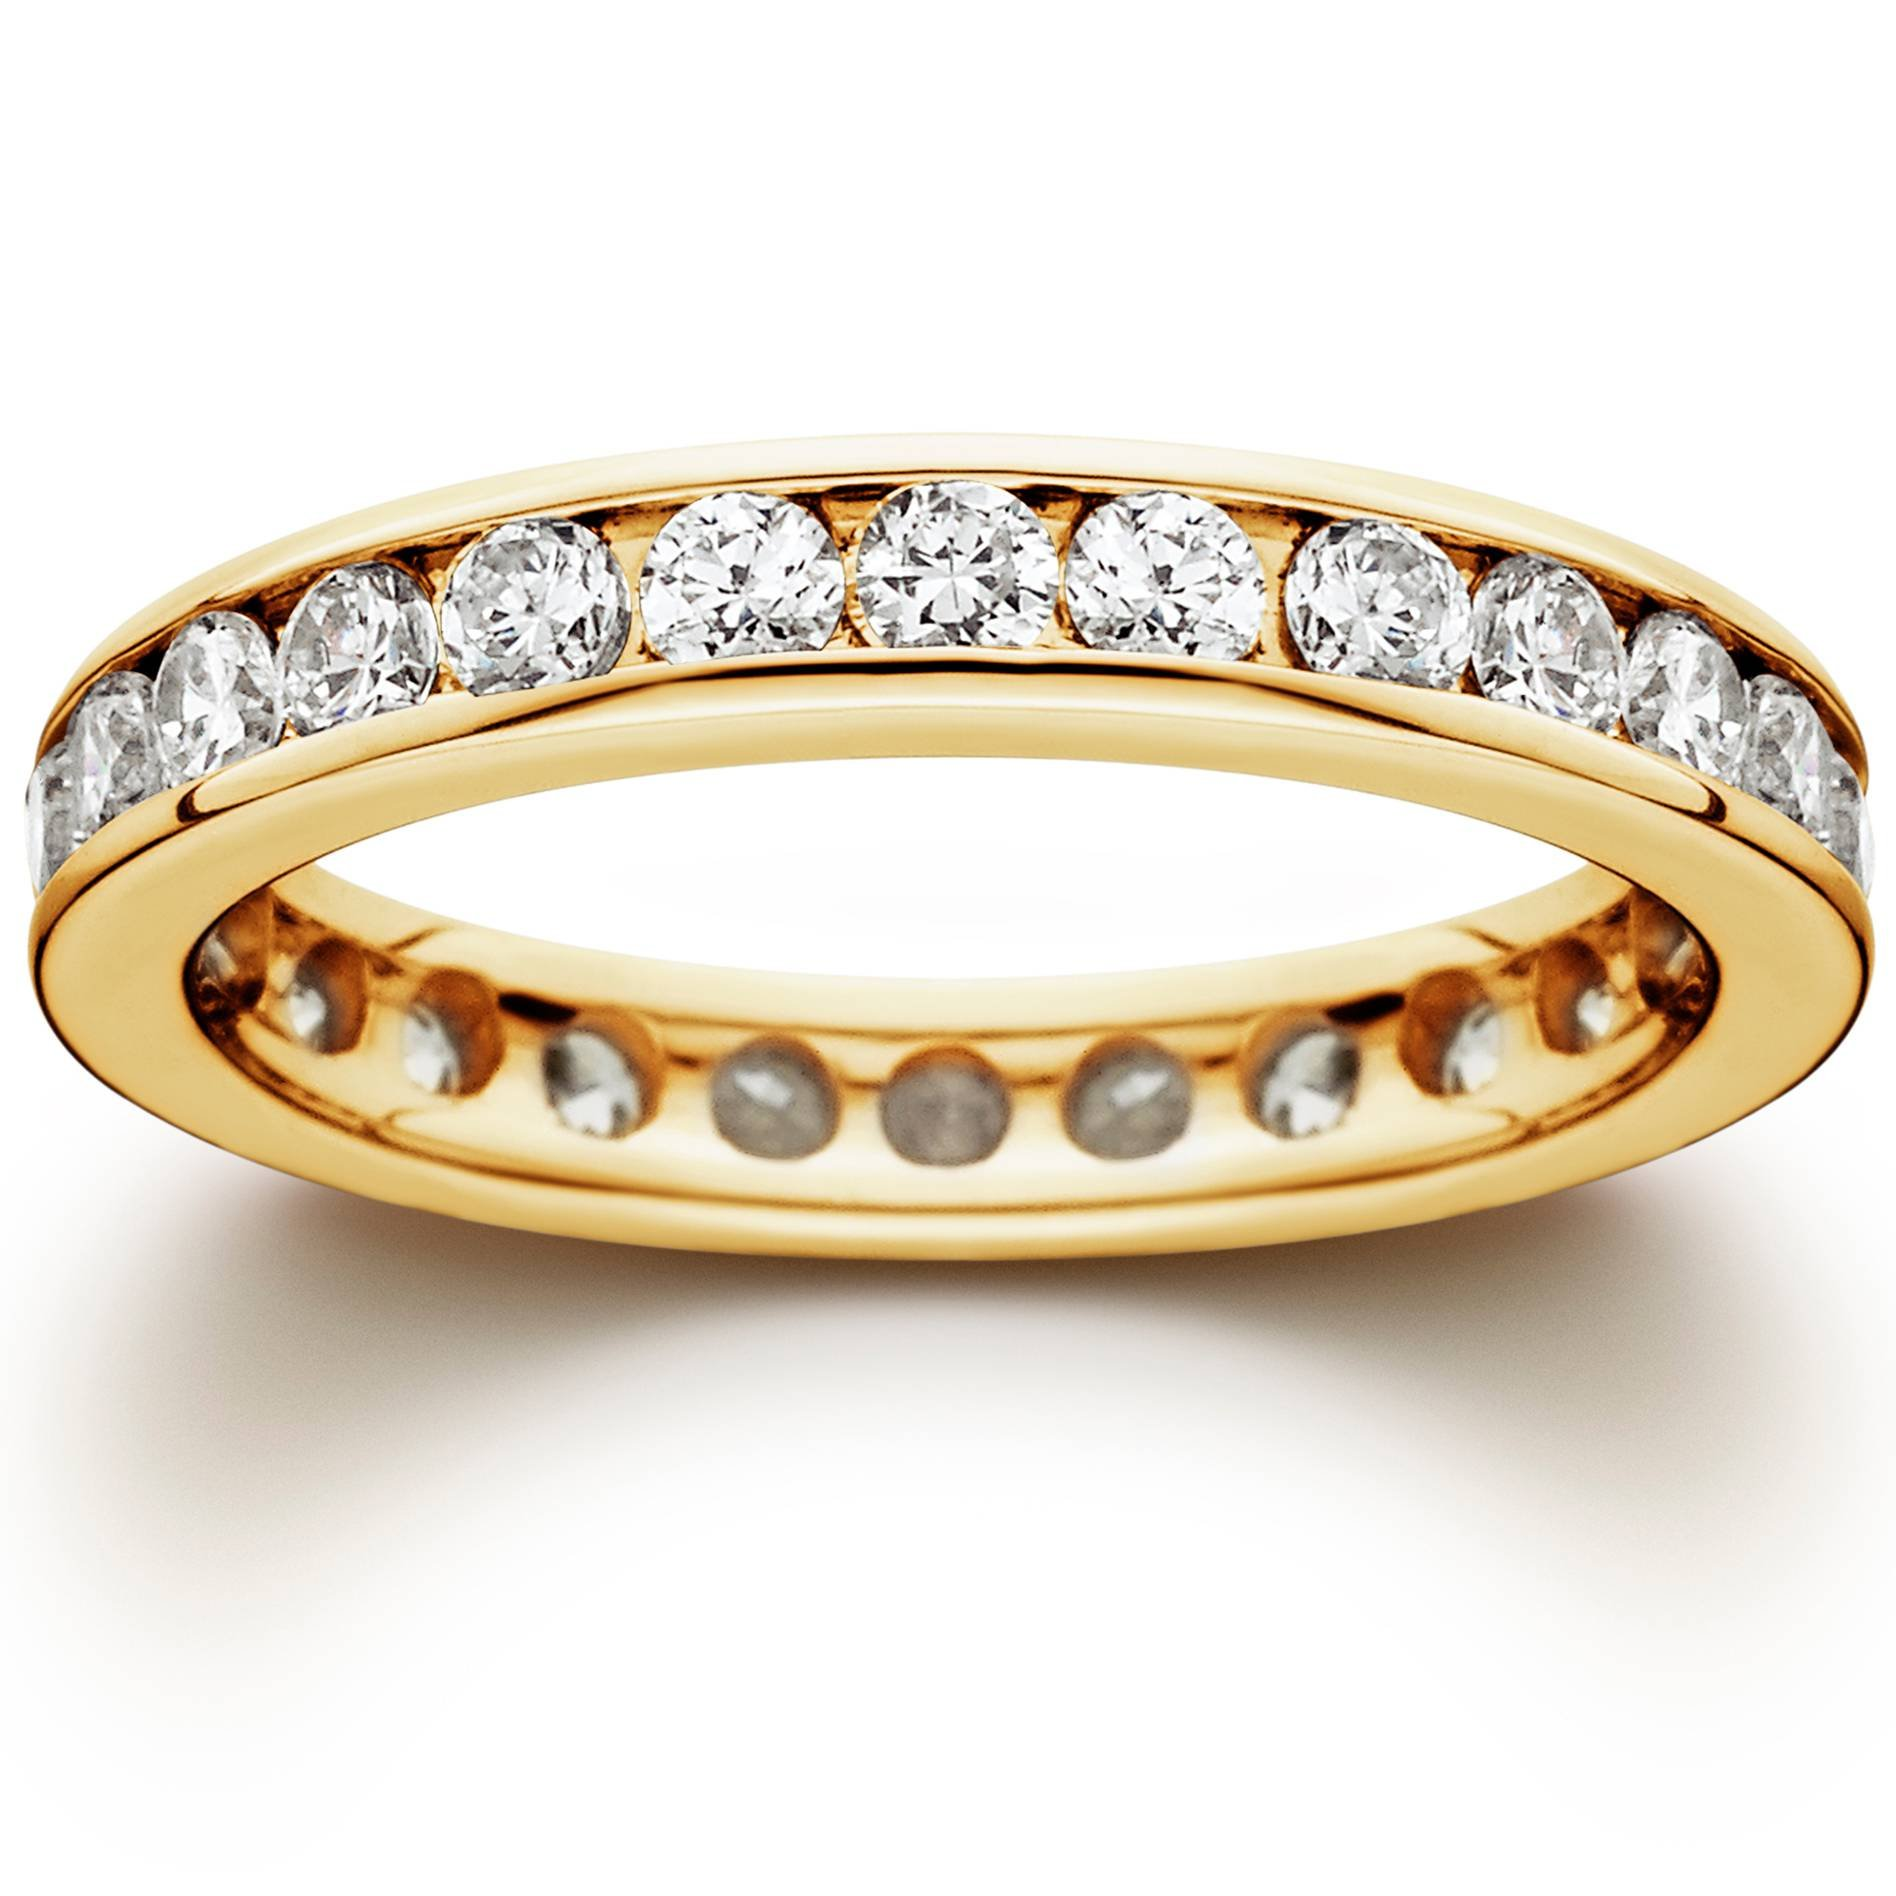 1 1/2 CT Channel Set Eternity Diamond Ring 14K Yellow Gold - Size 9